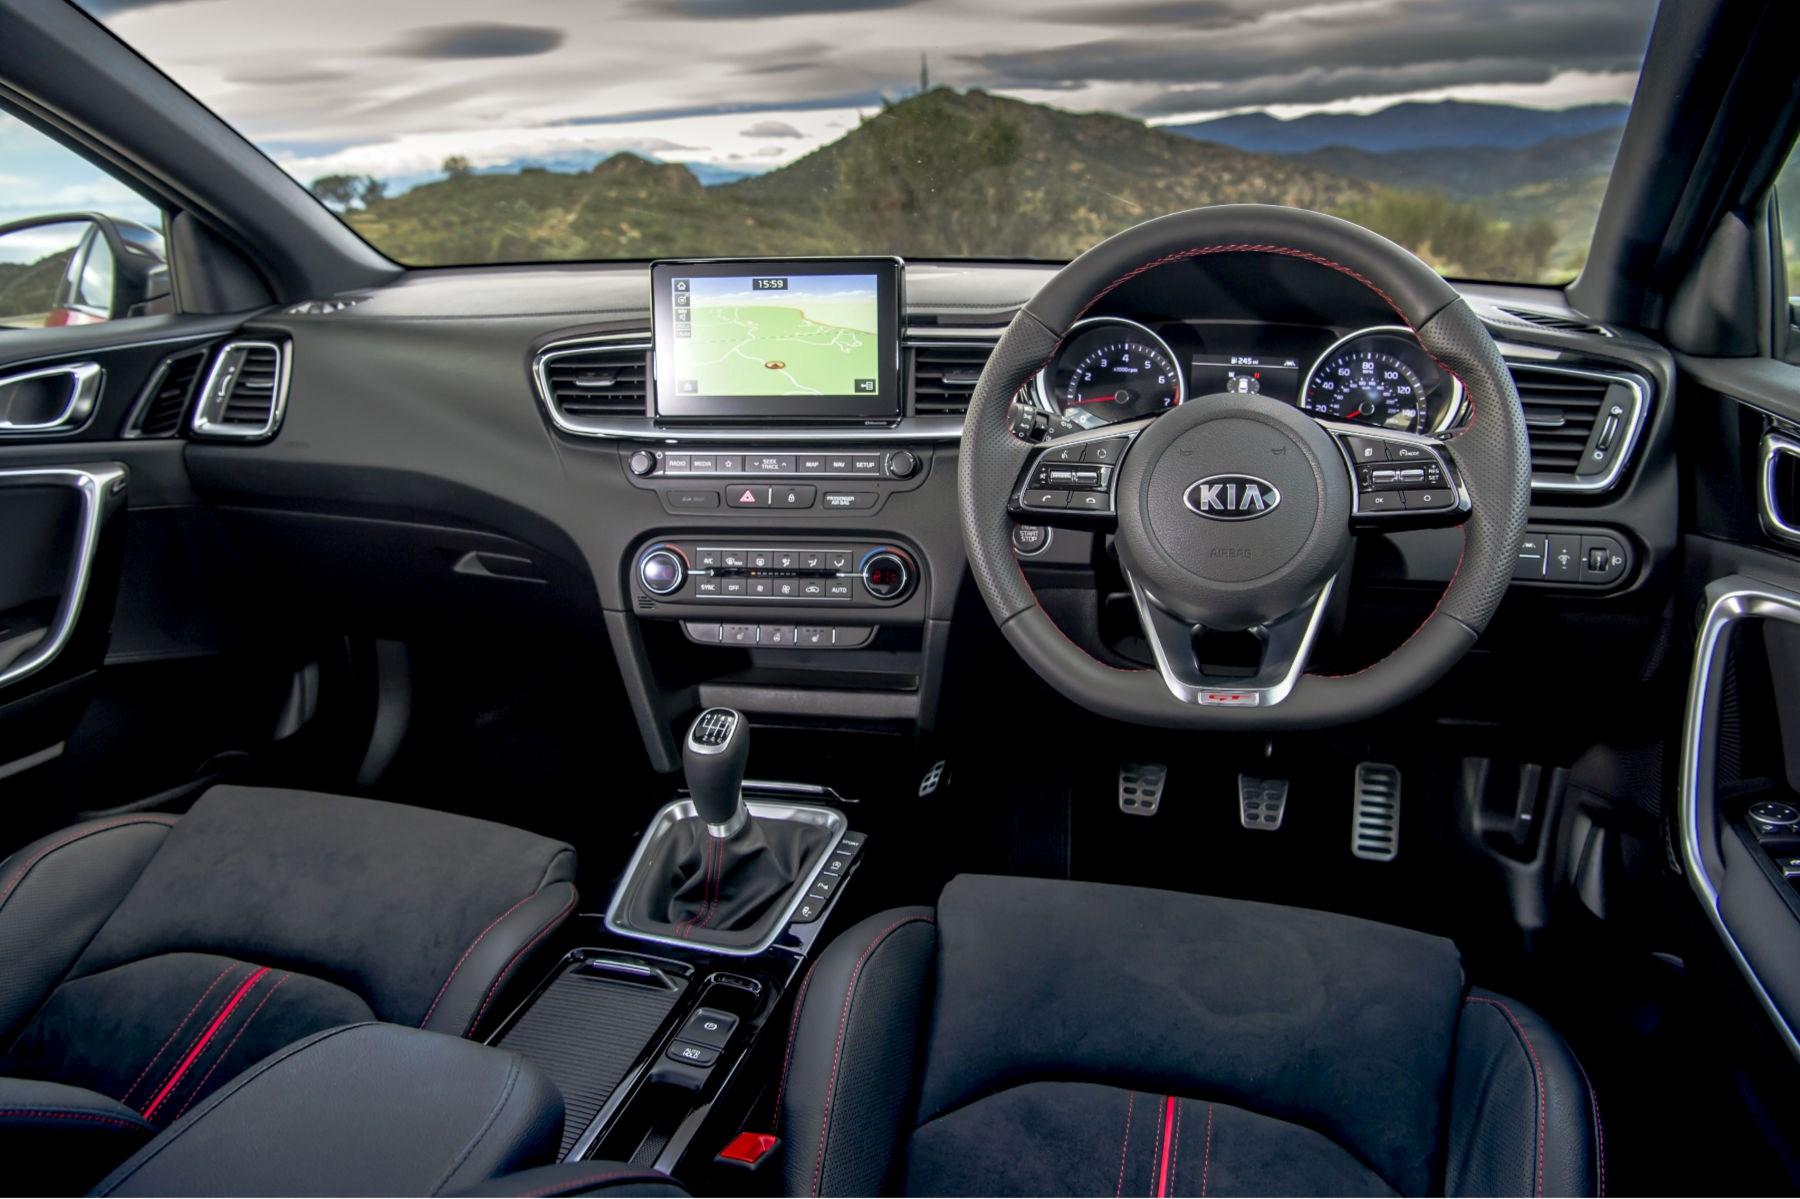 2020 Kia Ceed interior